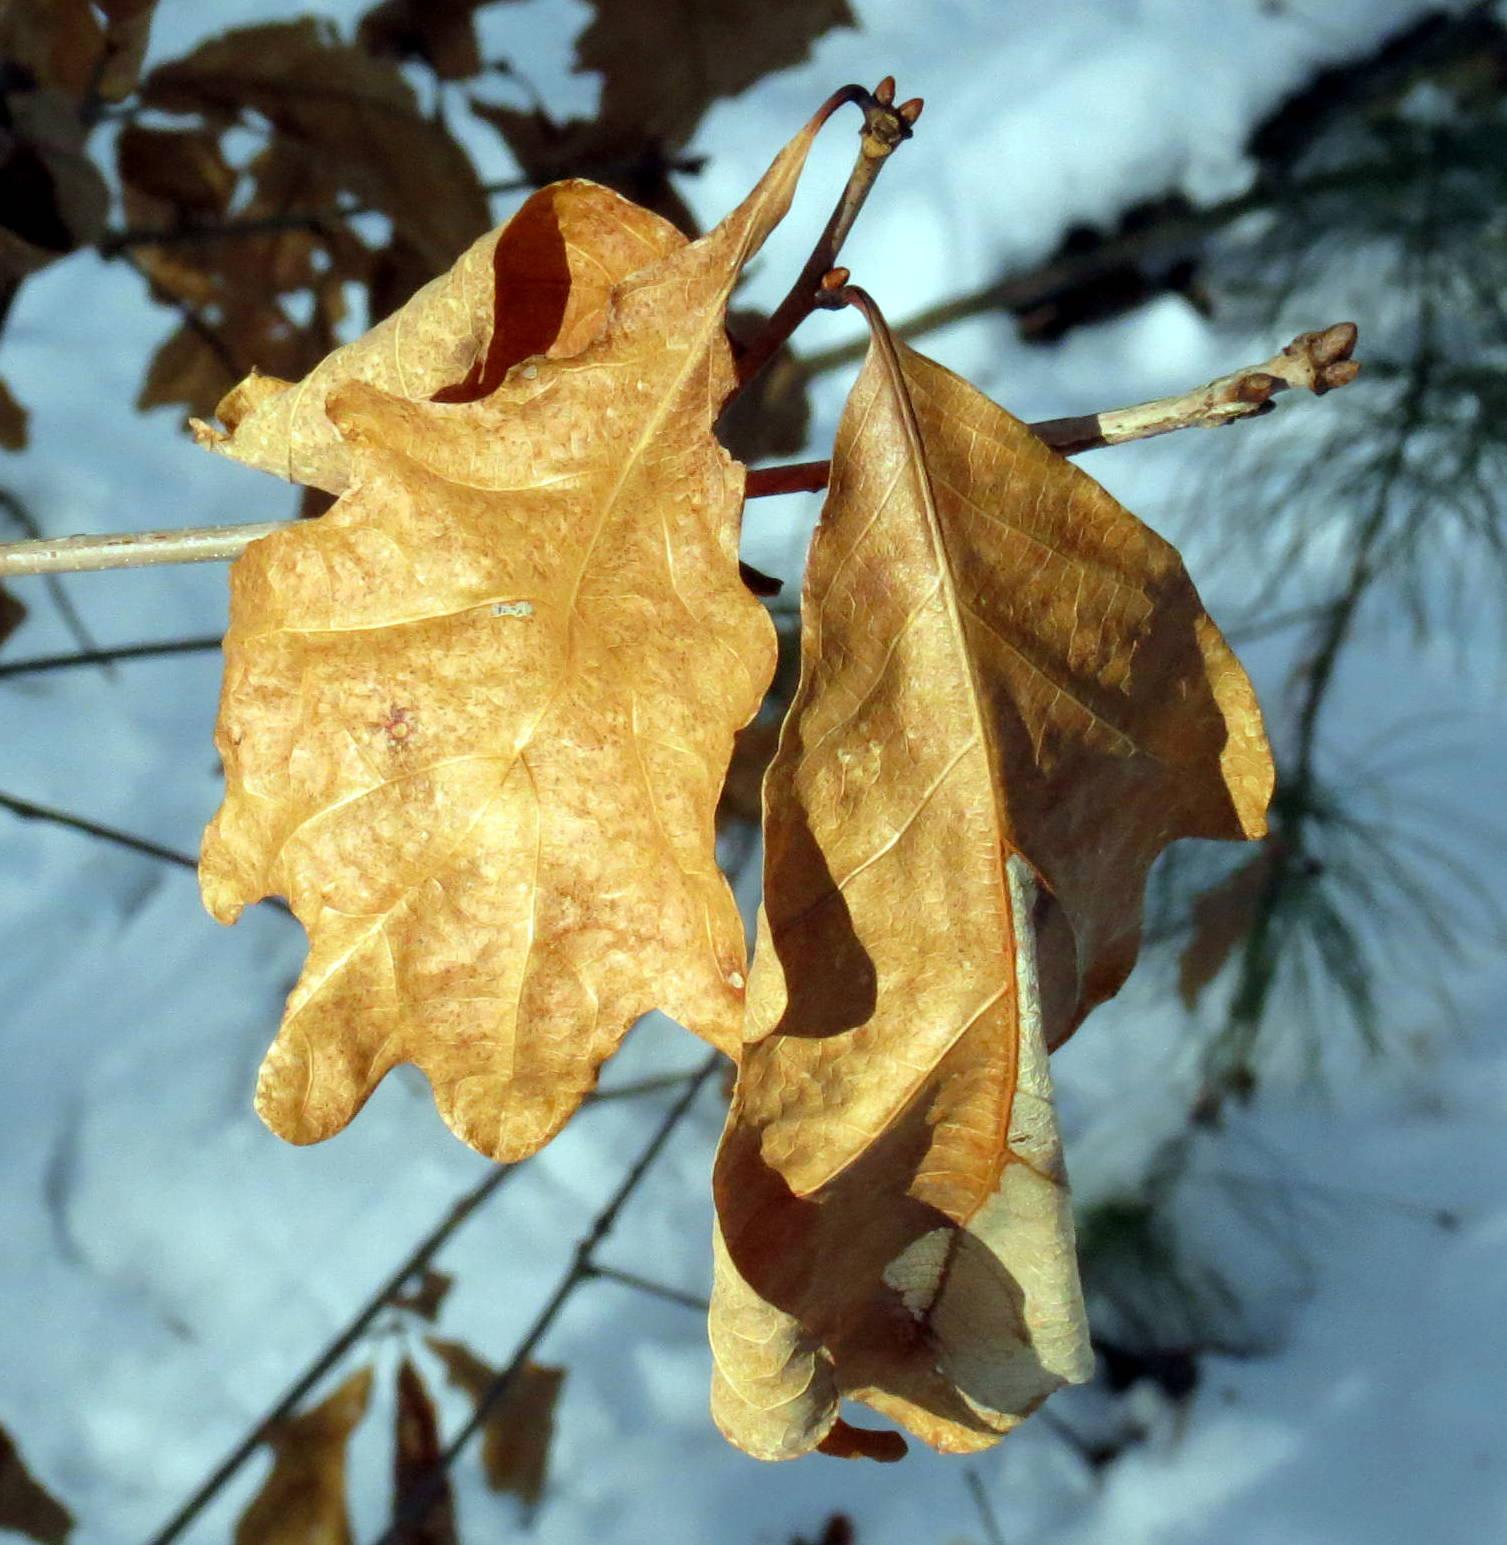 10. Oak Leaves